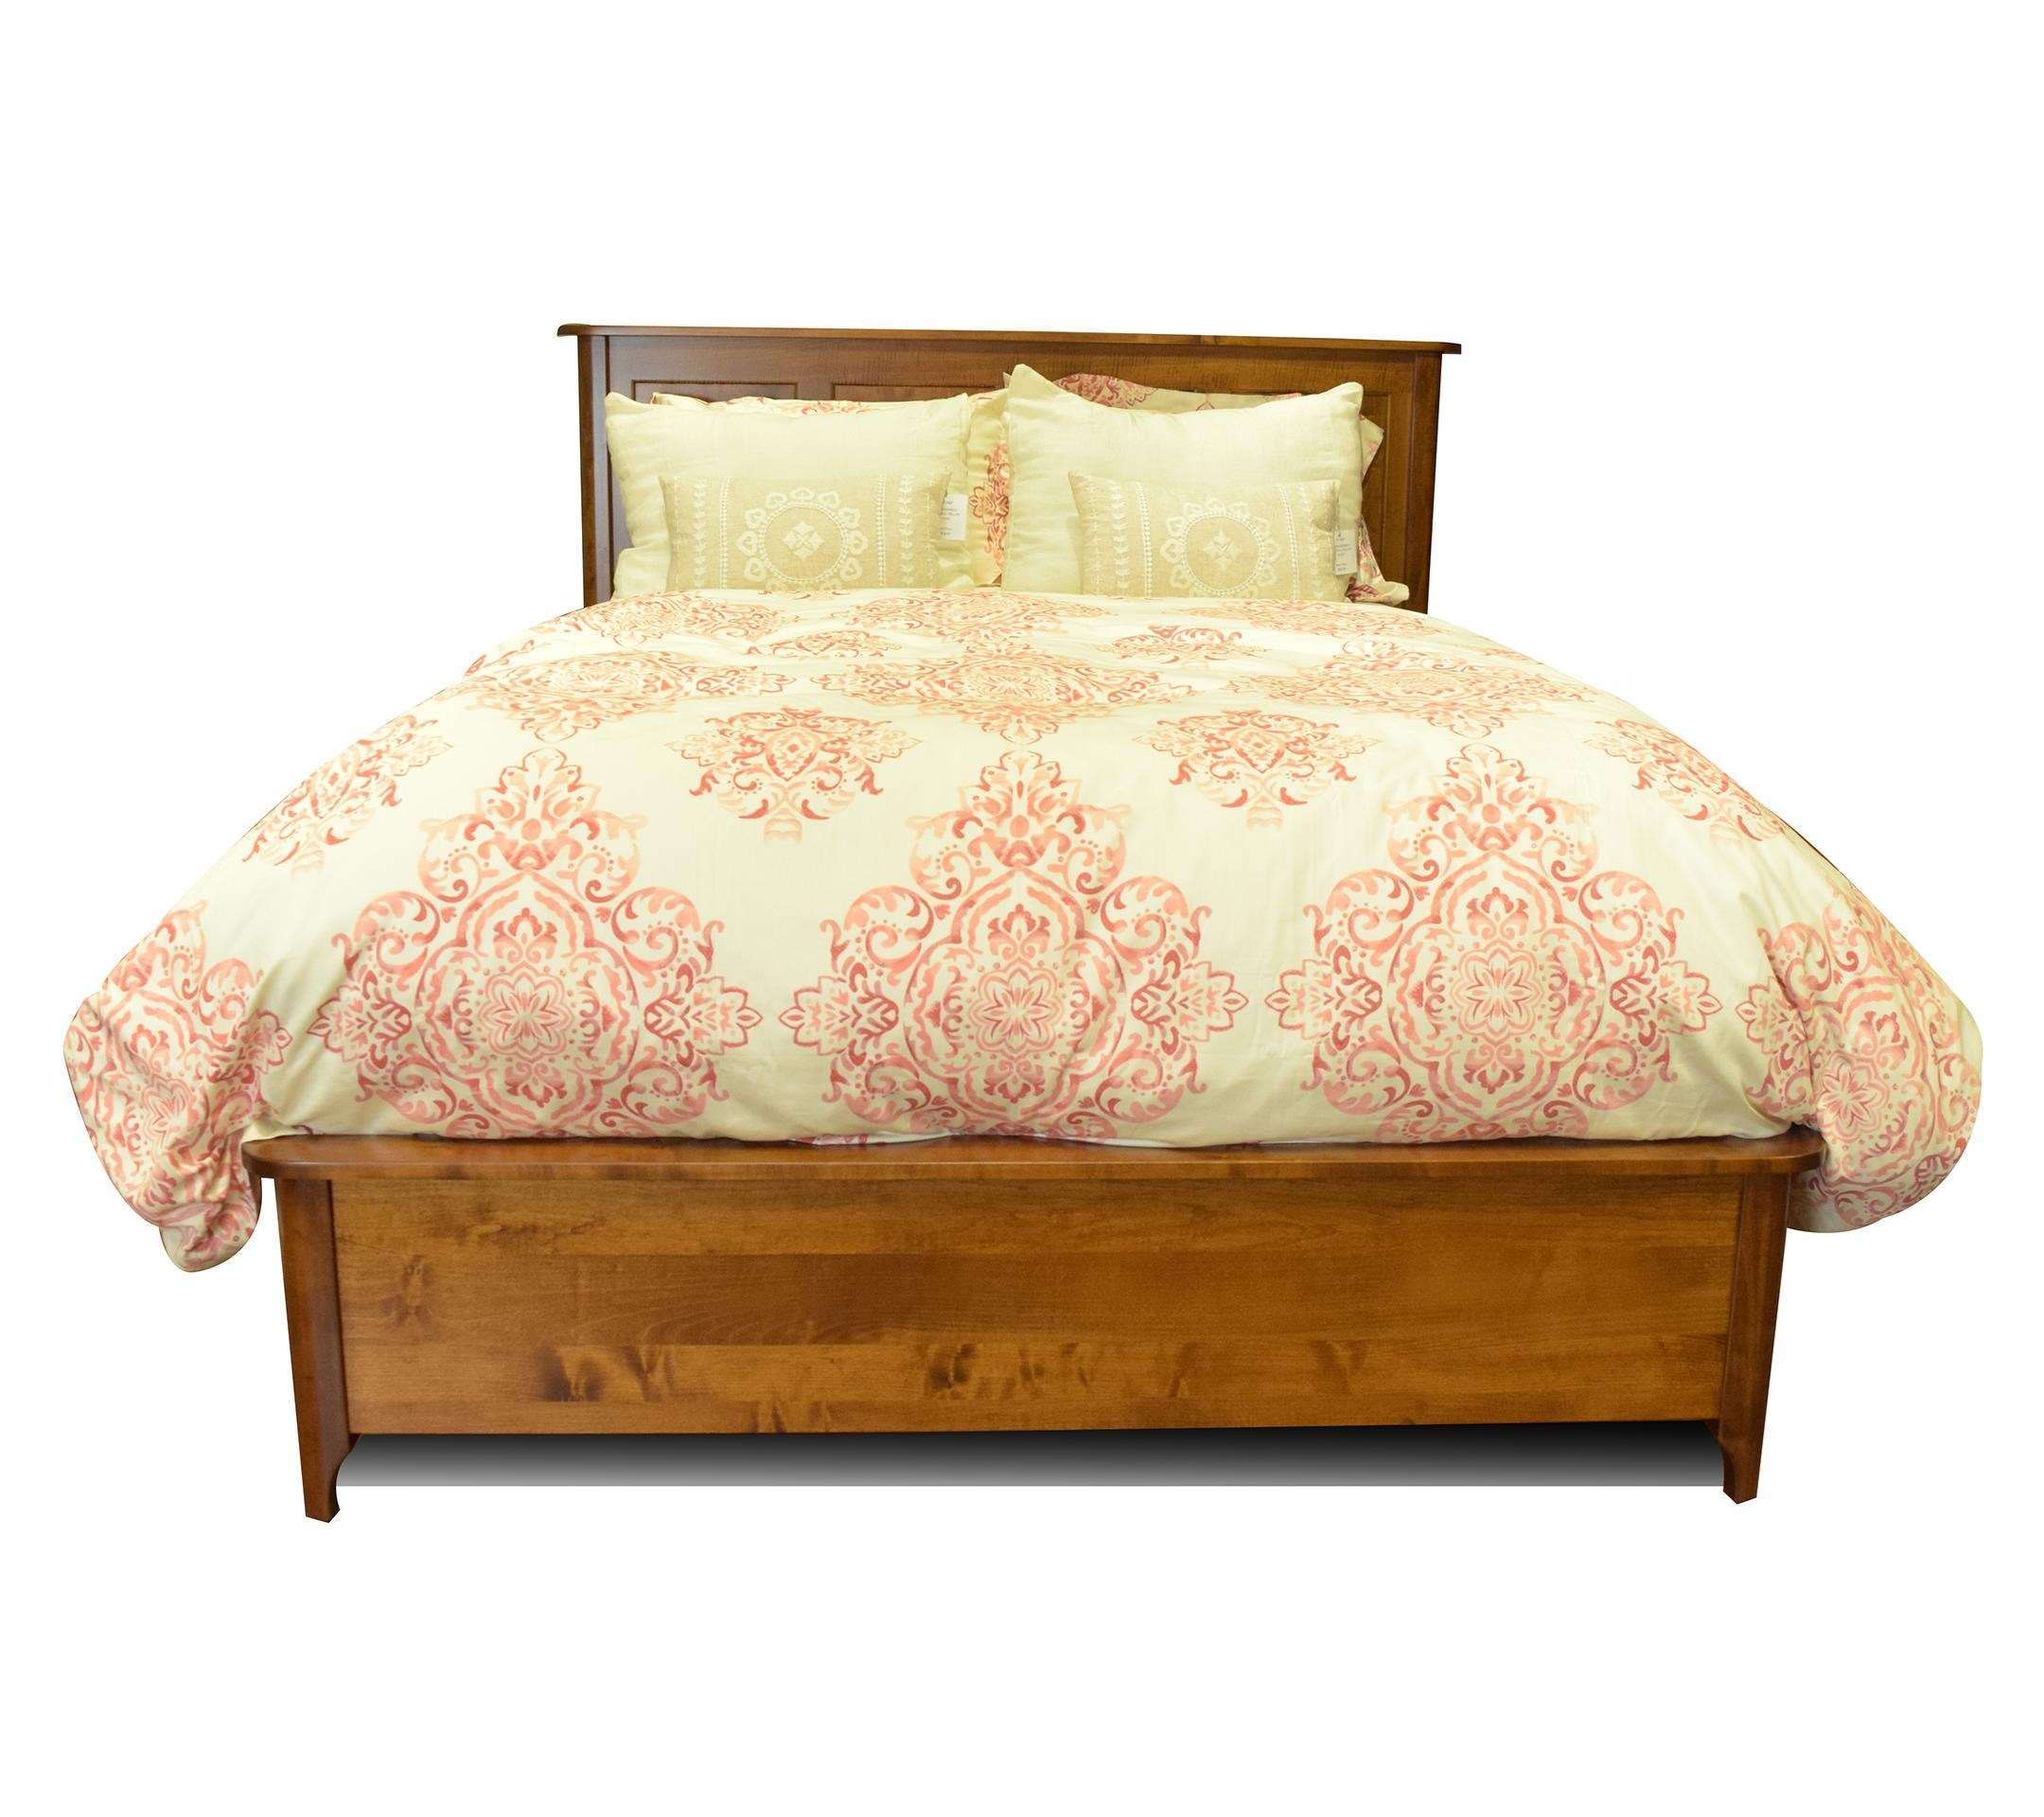 Amish King Bed